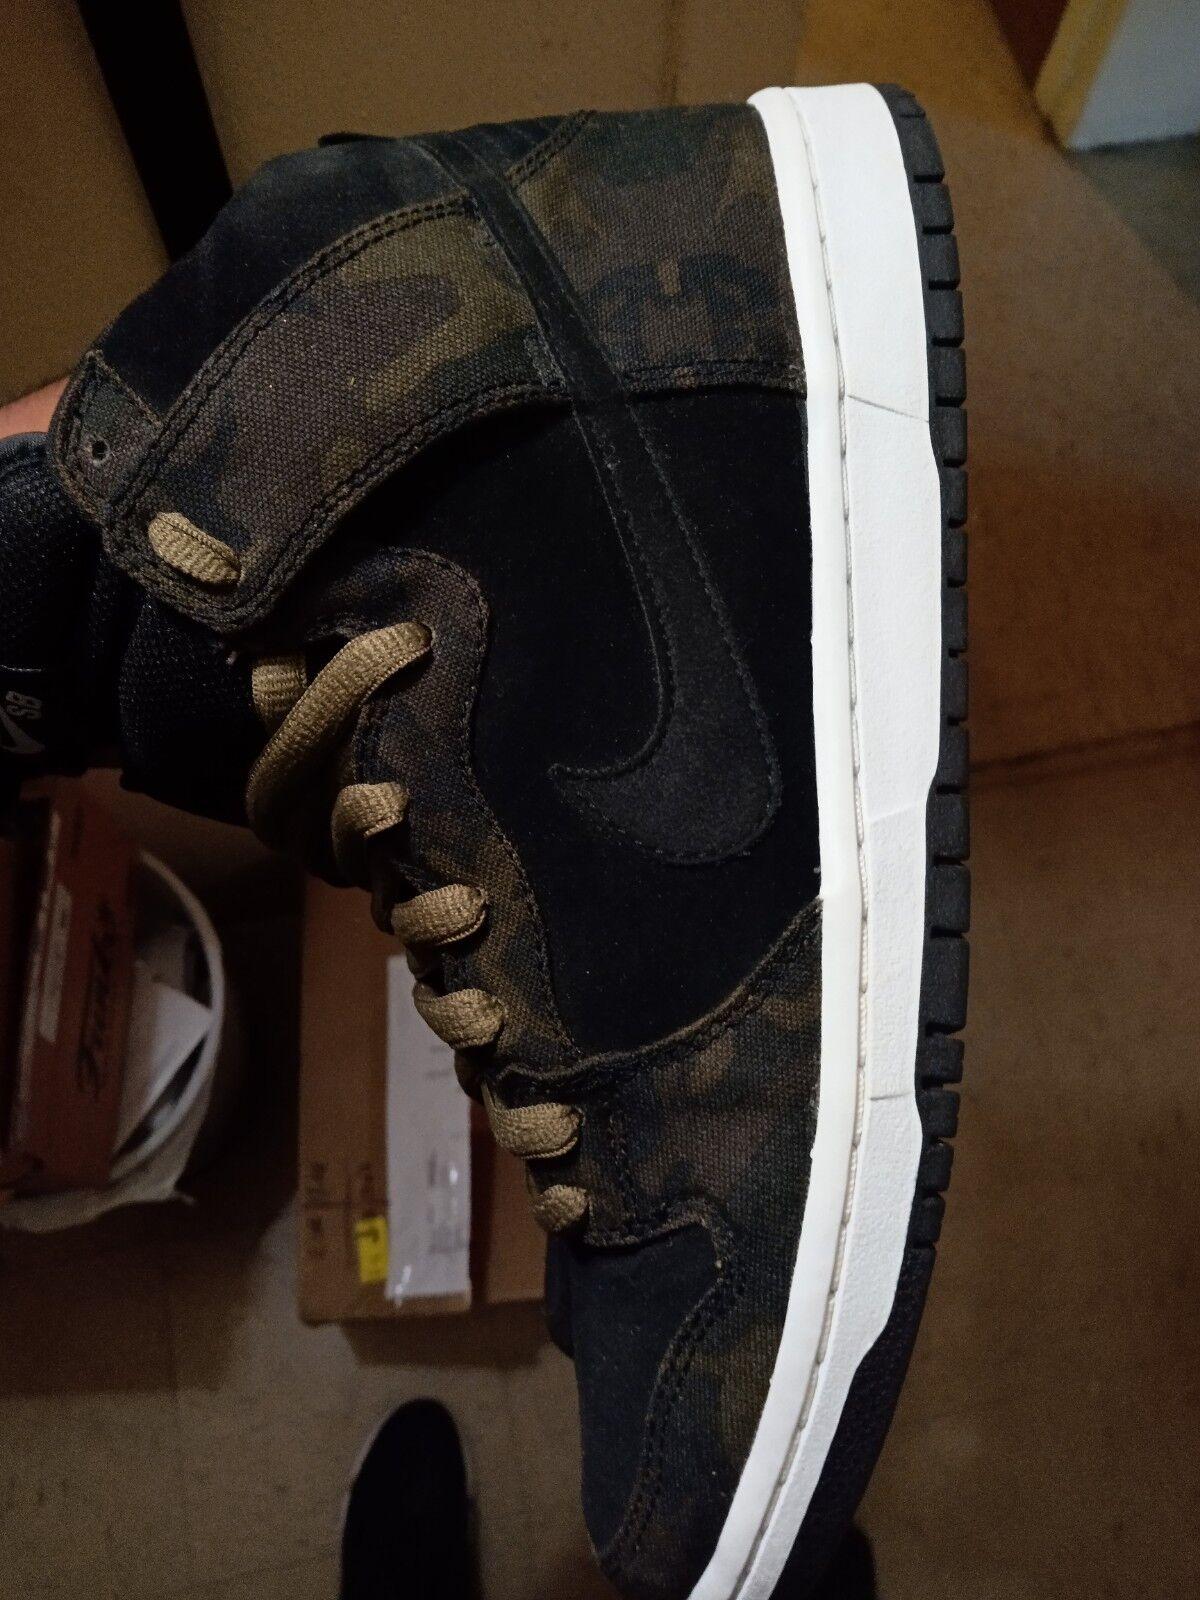 Nike Sb Dunk high iguana Camo vnds sz 10 supreme